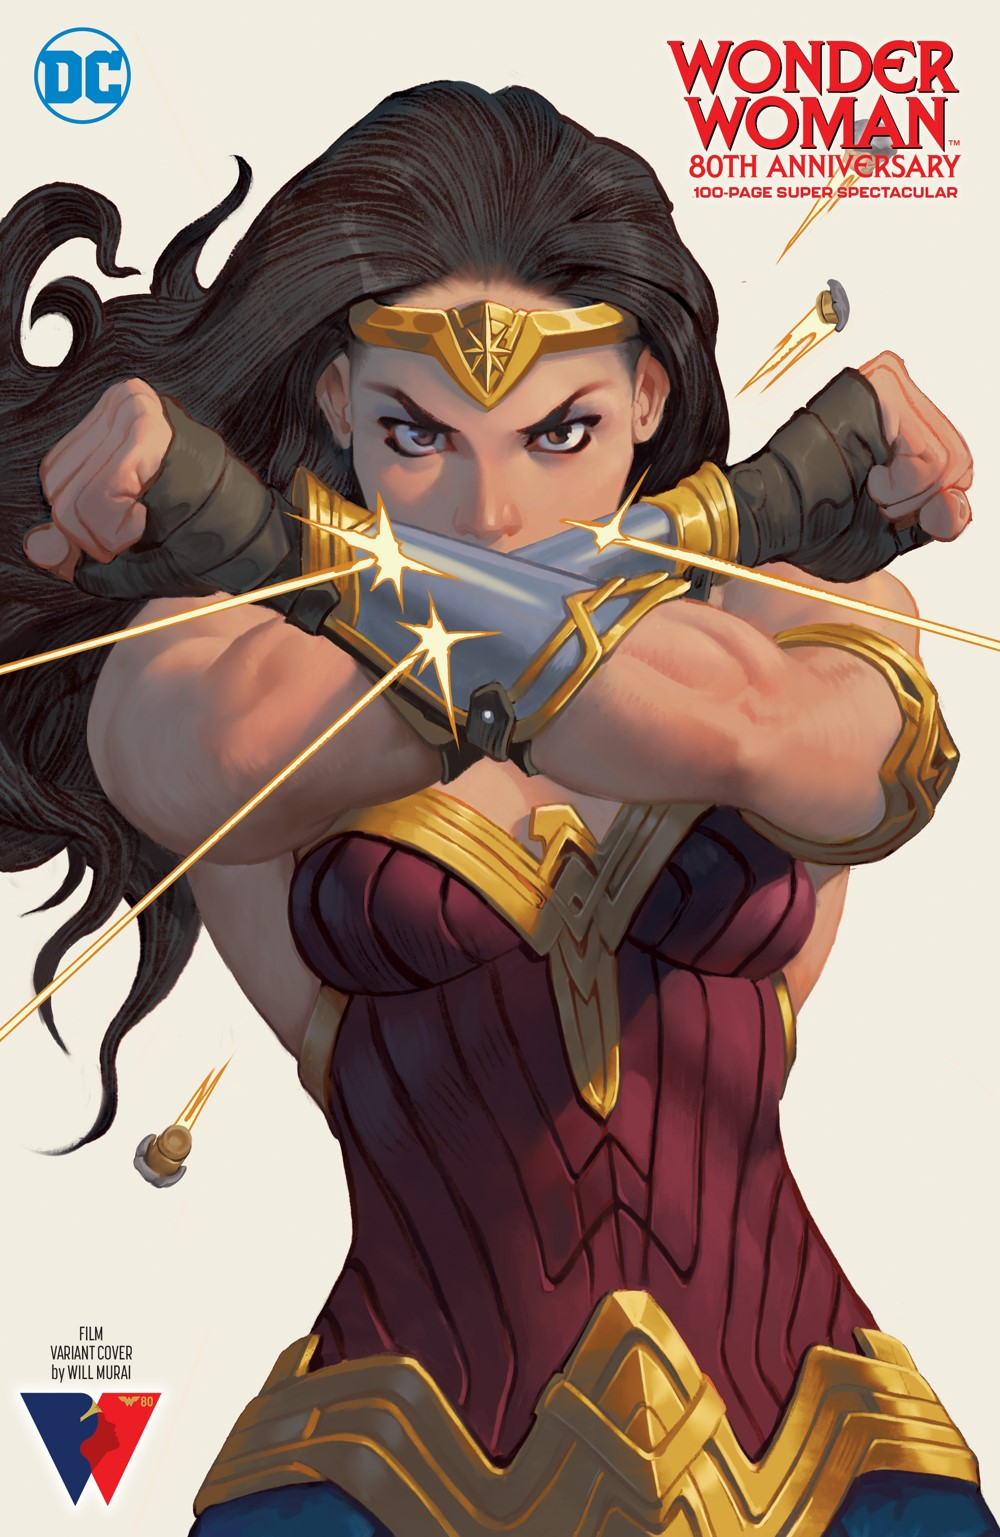 WW80THANN_Cv1_film_var_00121 DC Comics October 2021 Solicitations